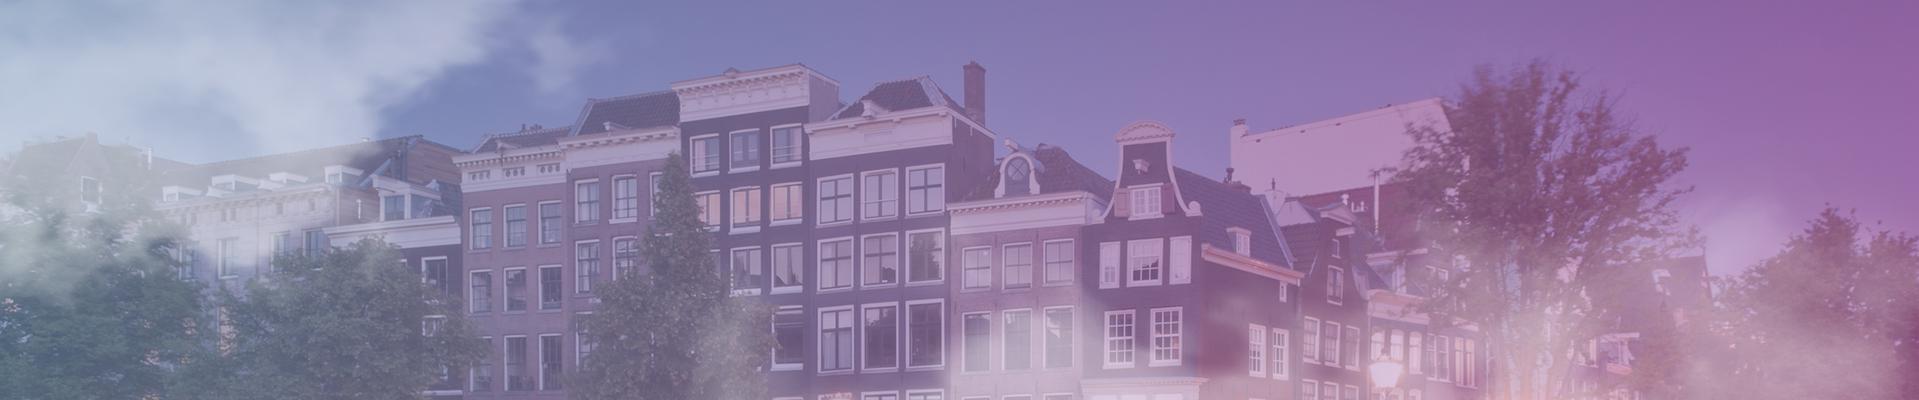 amsterdam banner